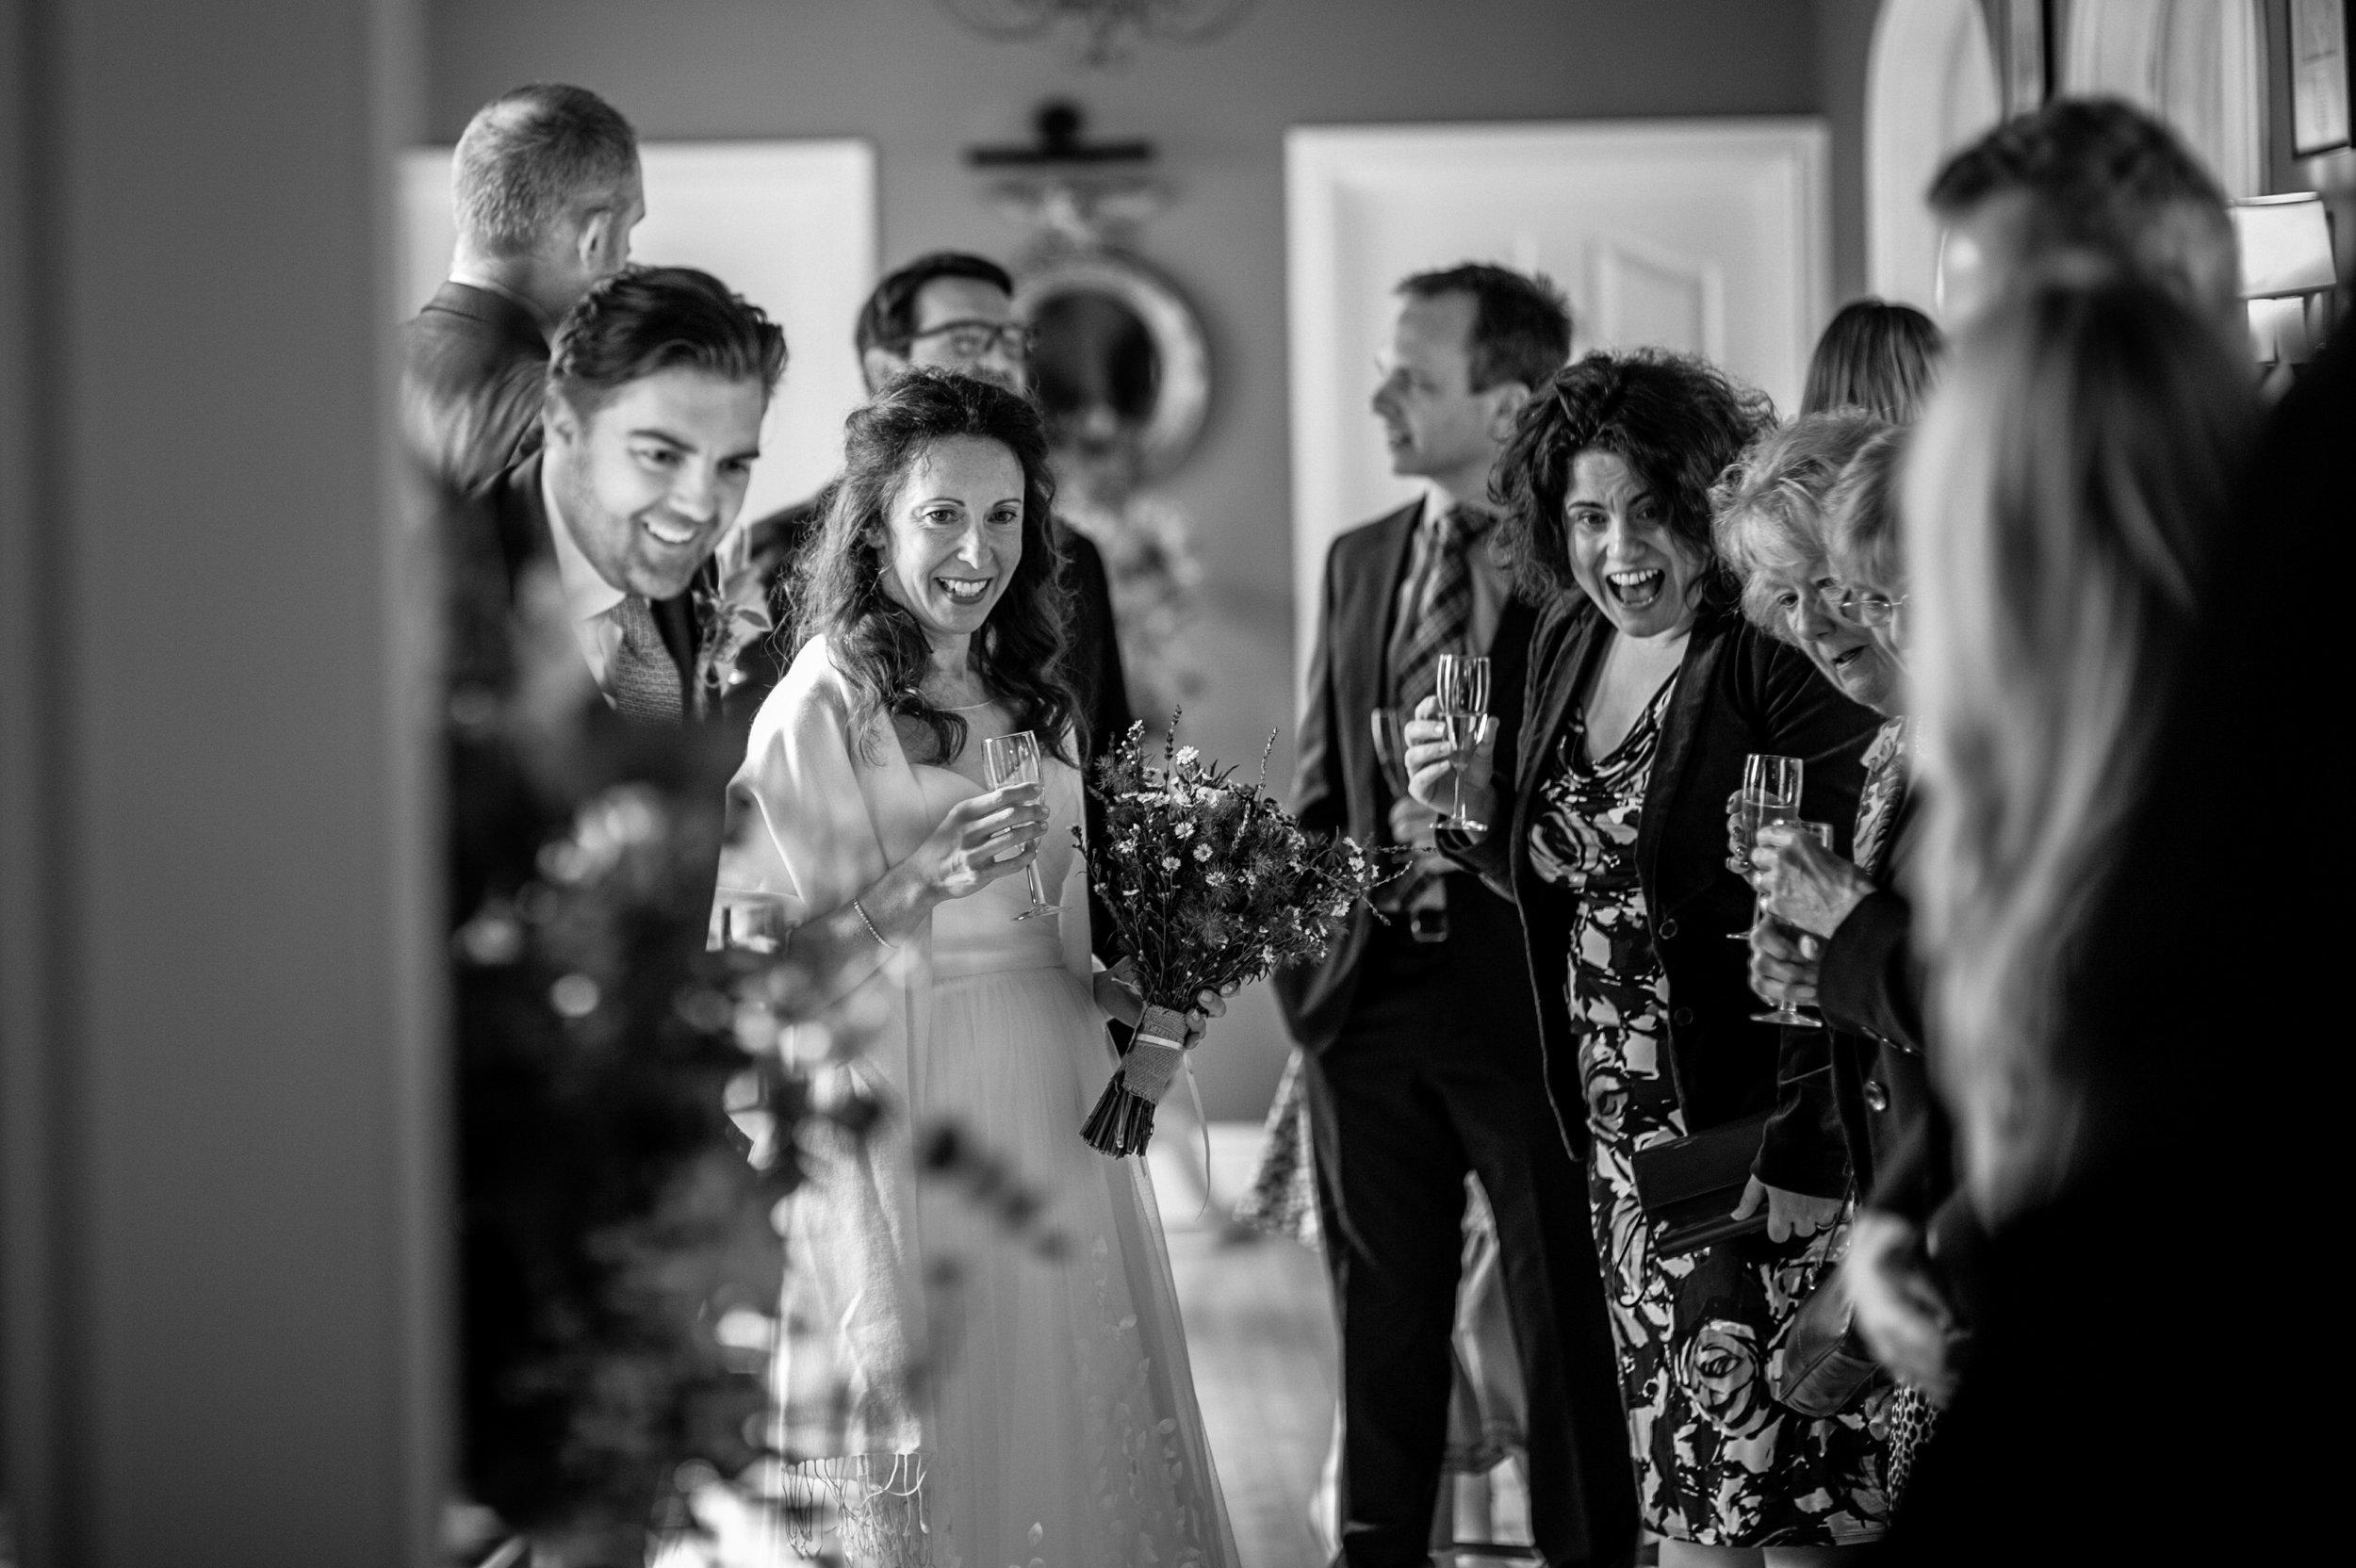 Beechfield house weddings - Abby and Greg (114 of 208).jpg